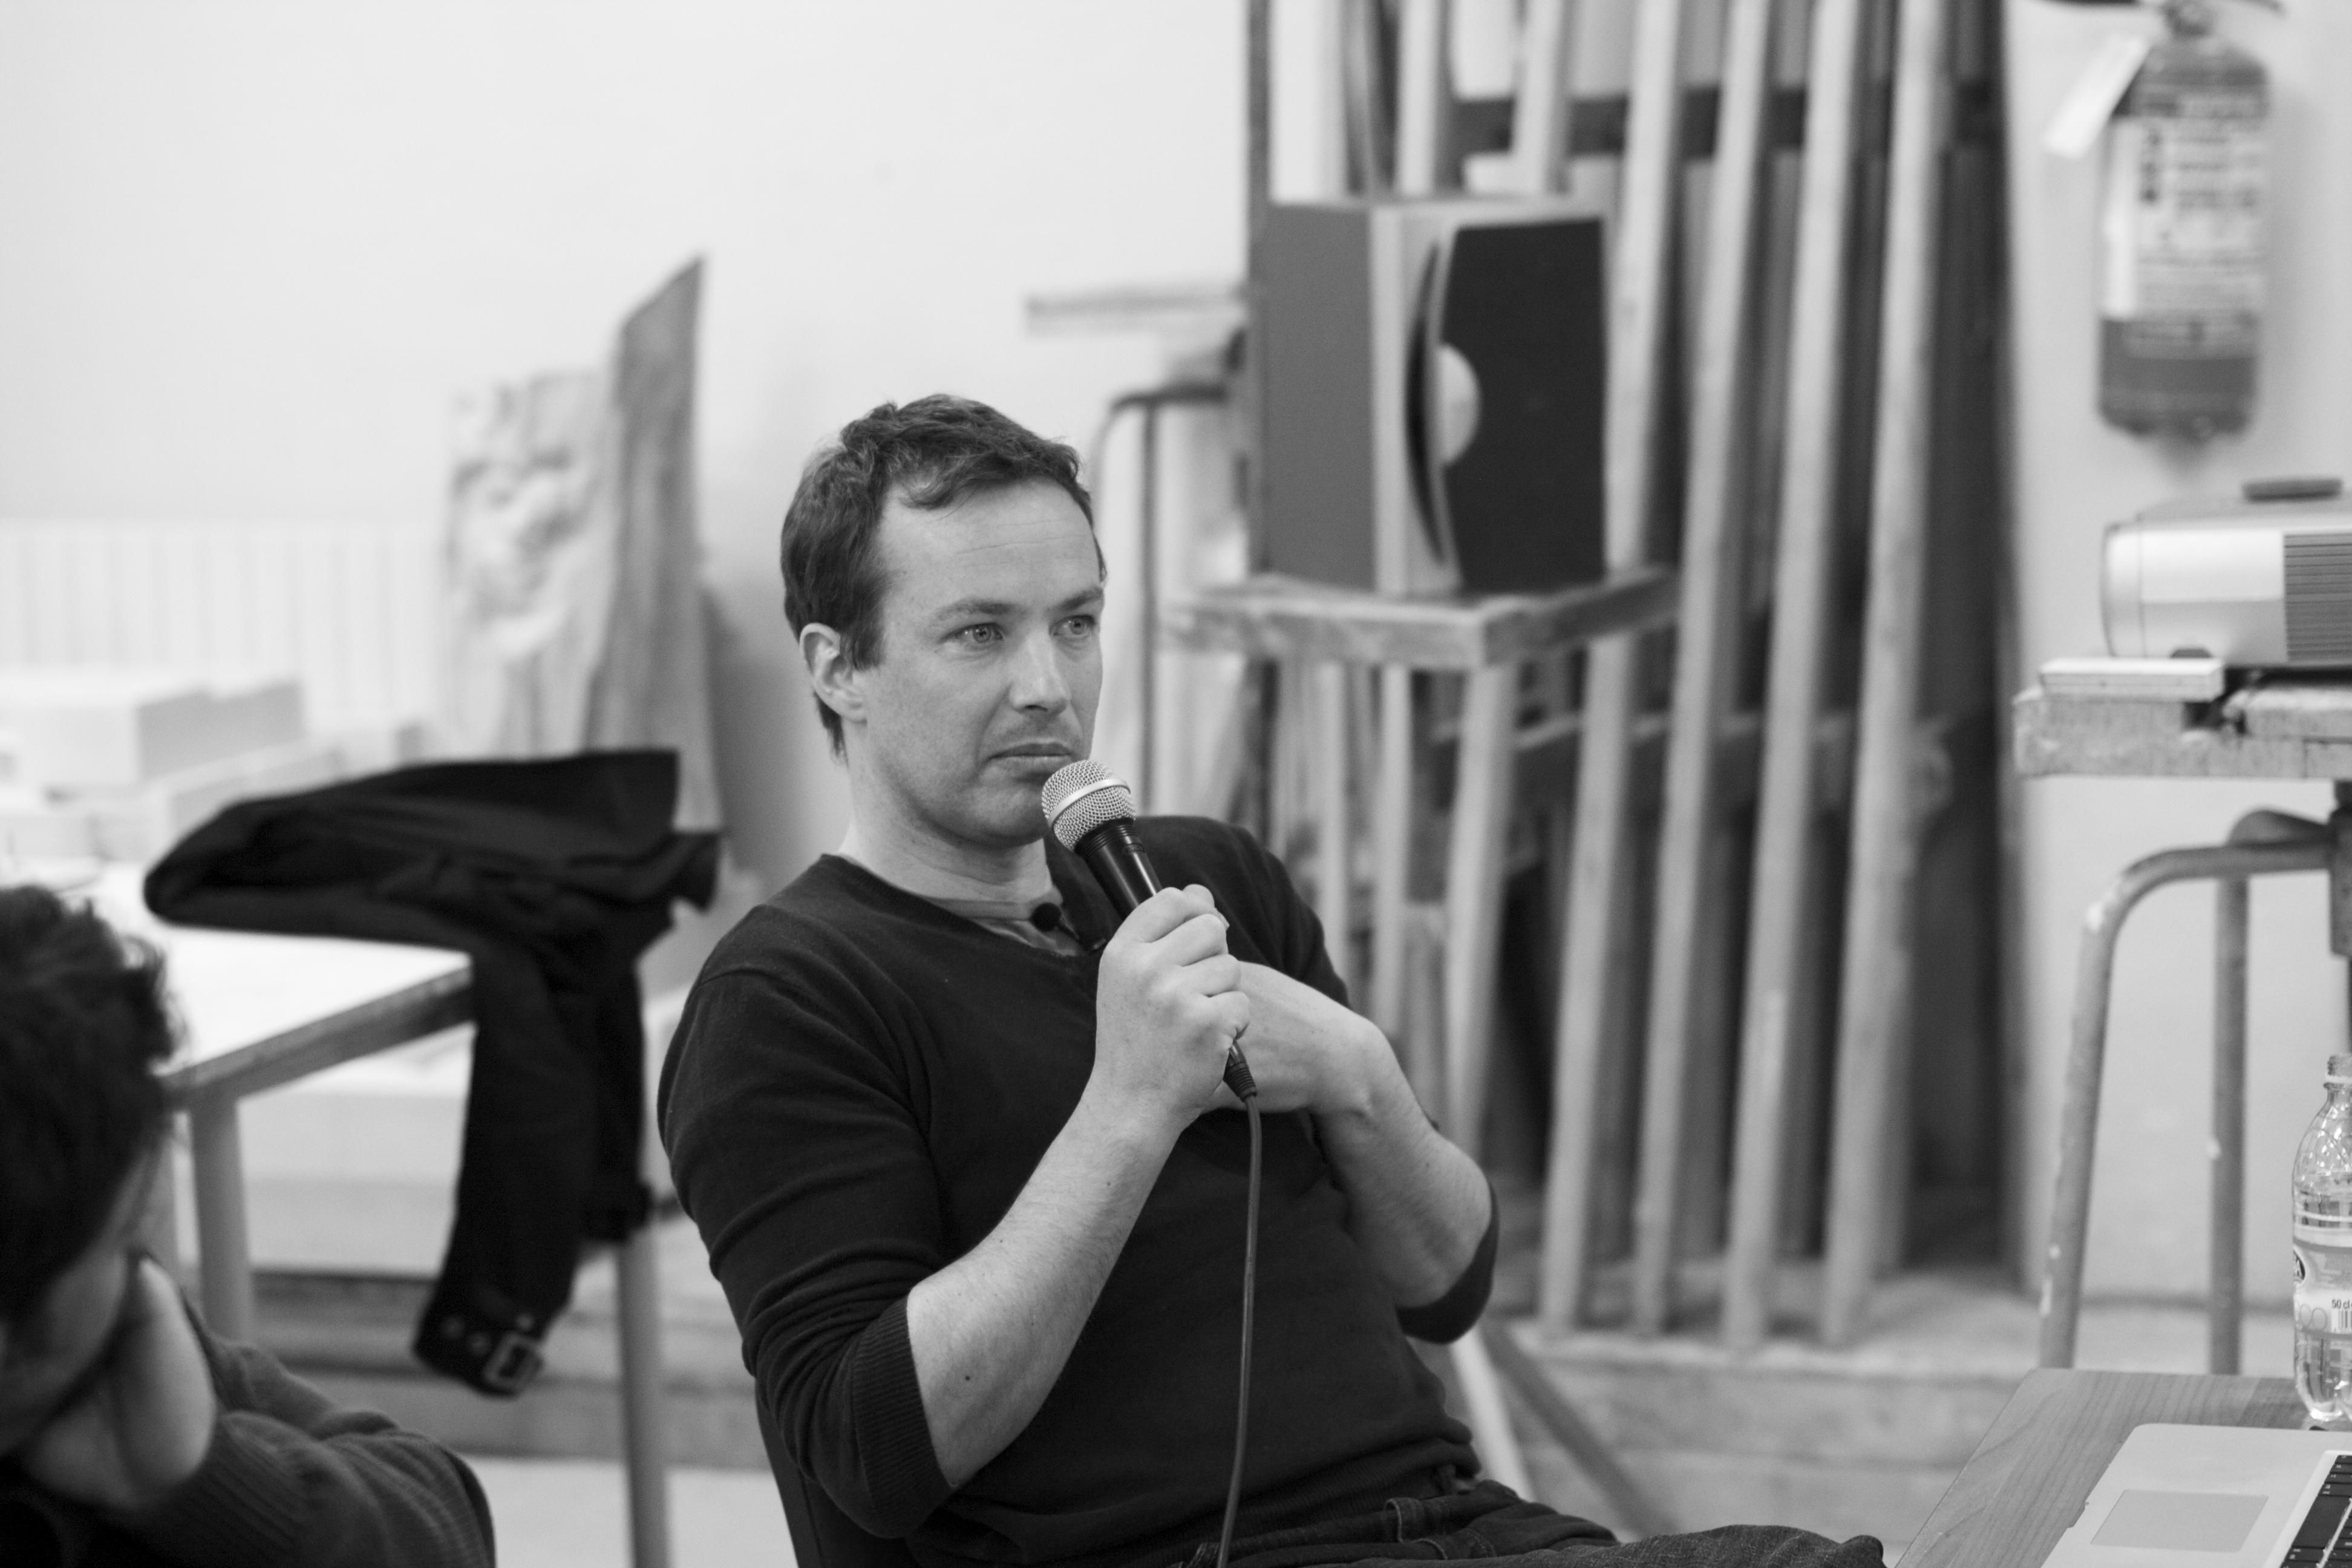 Flickr - Aron Demetz - Dialoghi e materia - Workshop a cura di Franco Reina17